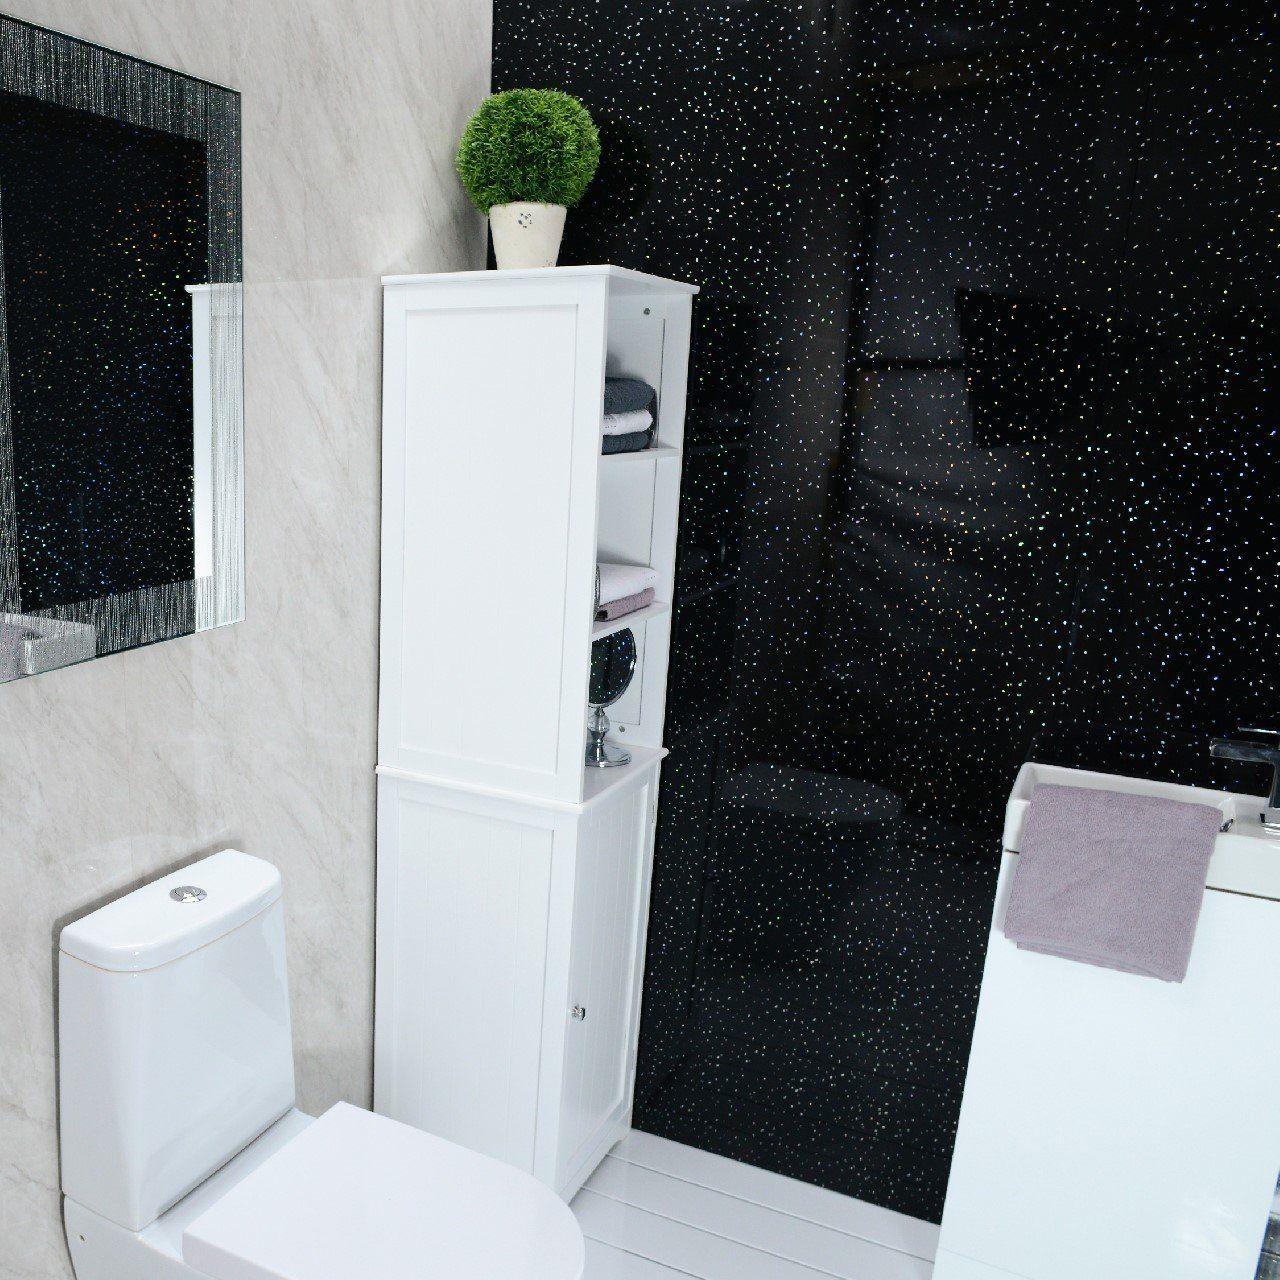 Black Bathroom Panels Pvc For Shower Cladding Wall Panels Ceiling Panels Black Sparkle Diamond 100 Waterproof Black Bathroom Bathroom Paneling Ceiling Panels